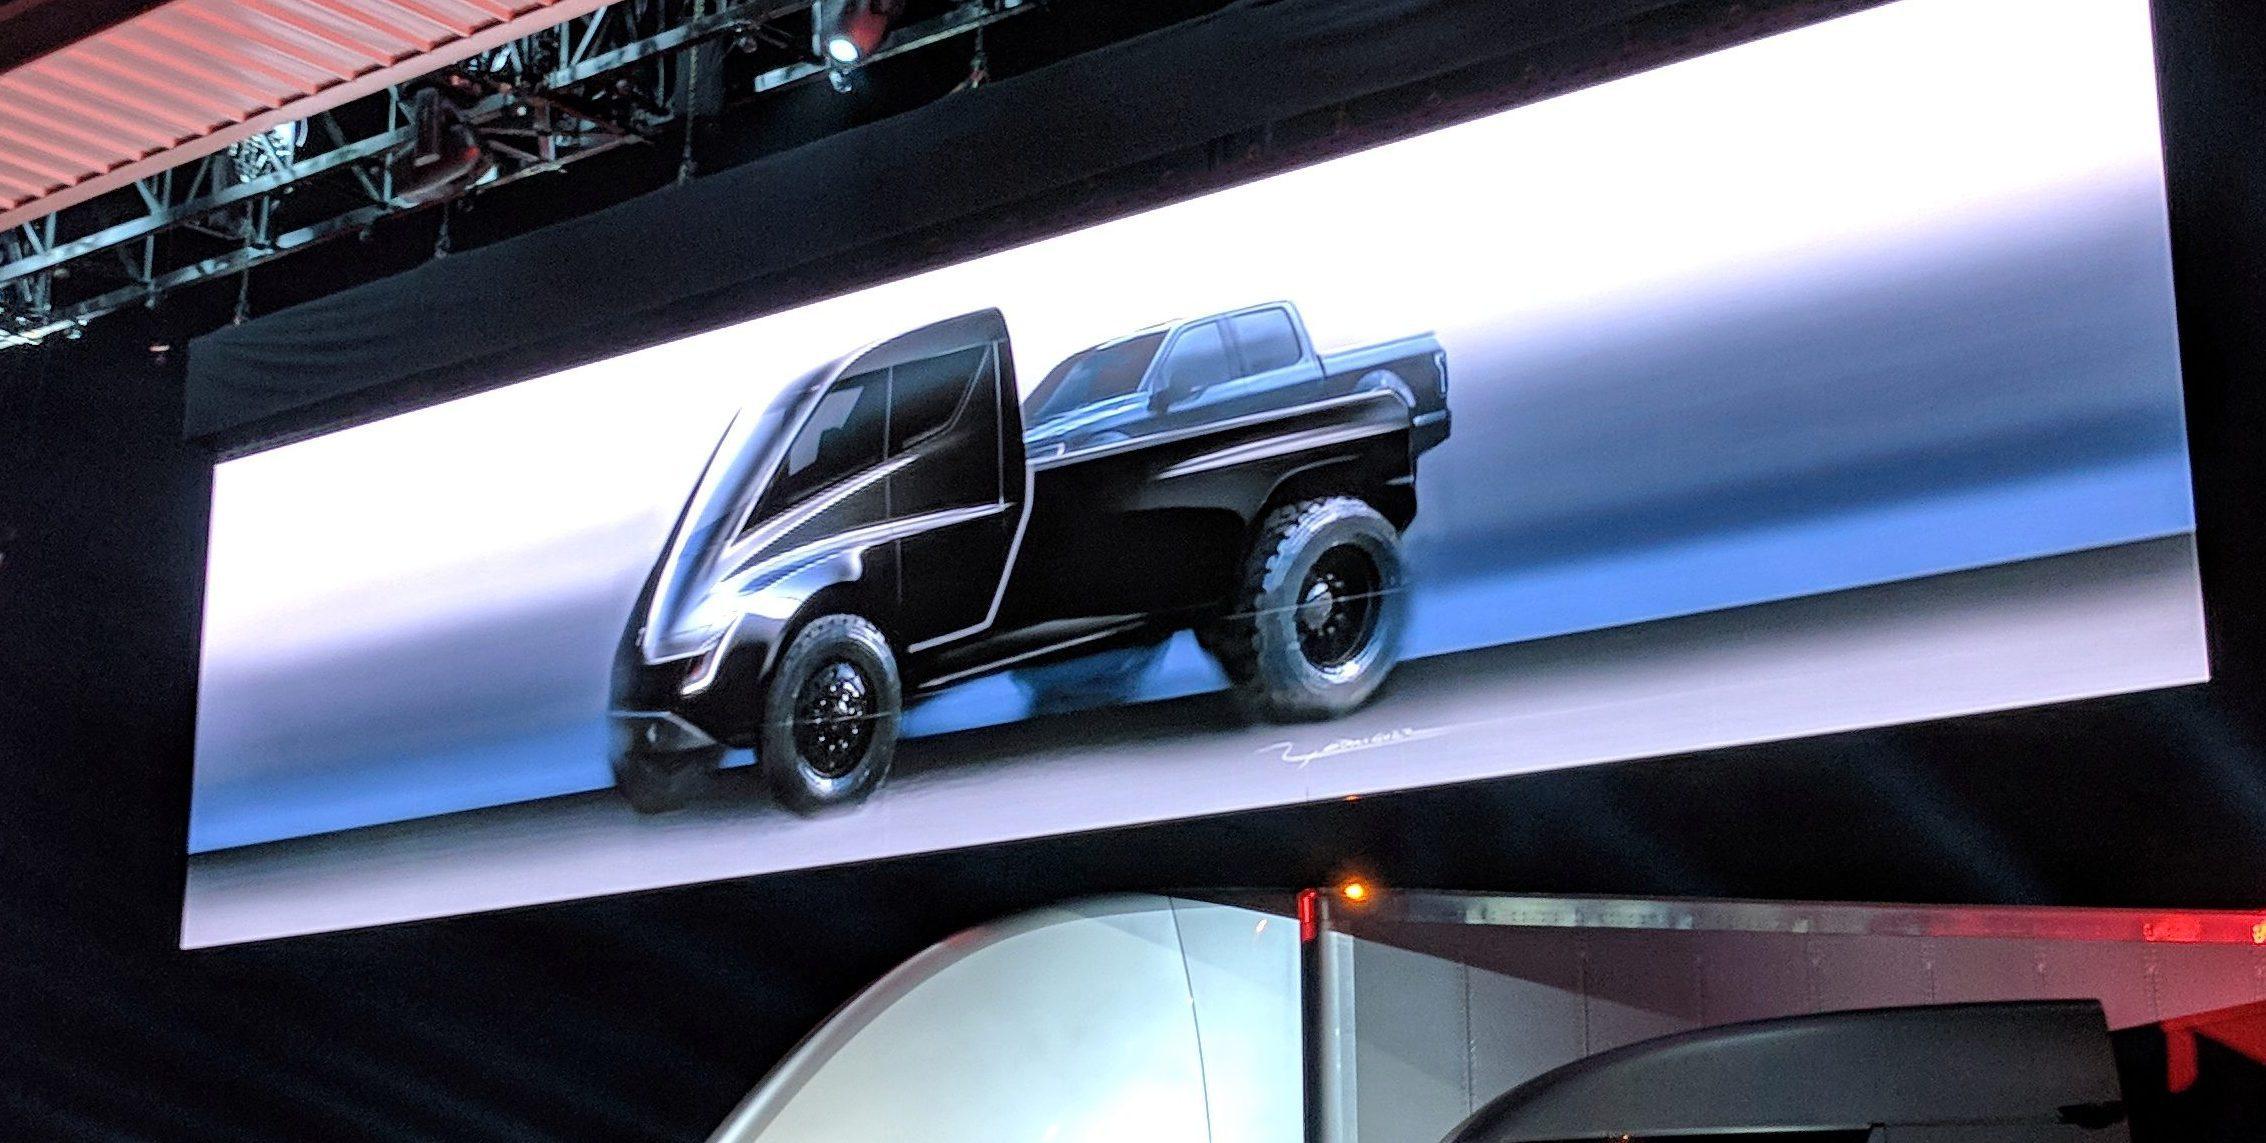 Elon Musk updates Tesla pickup and semi truck timelines - Electrek